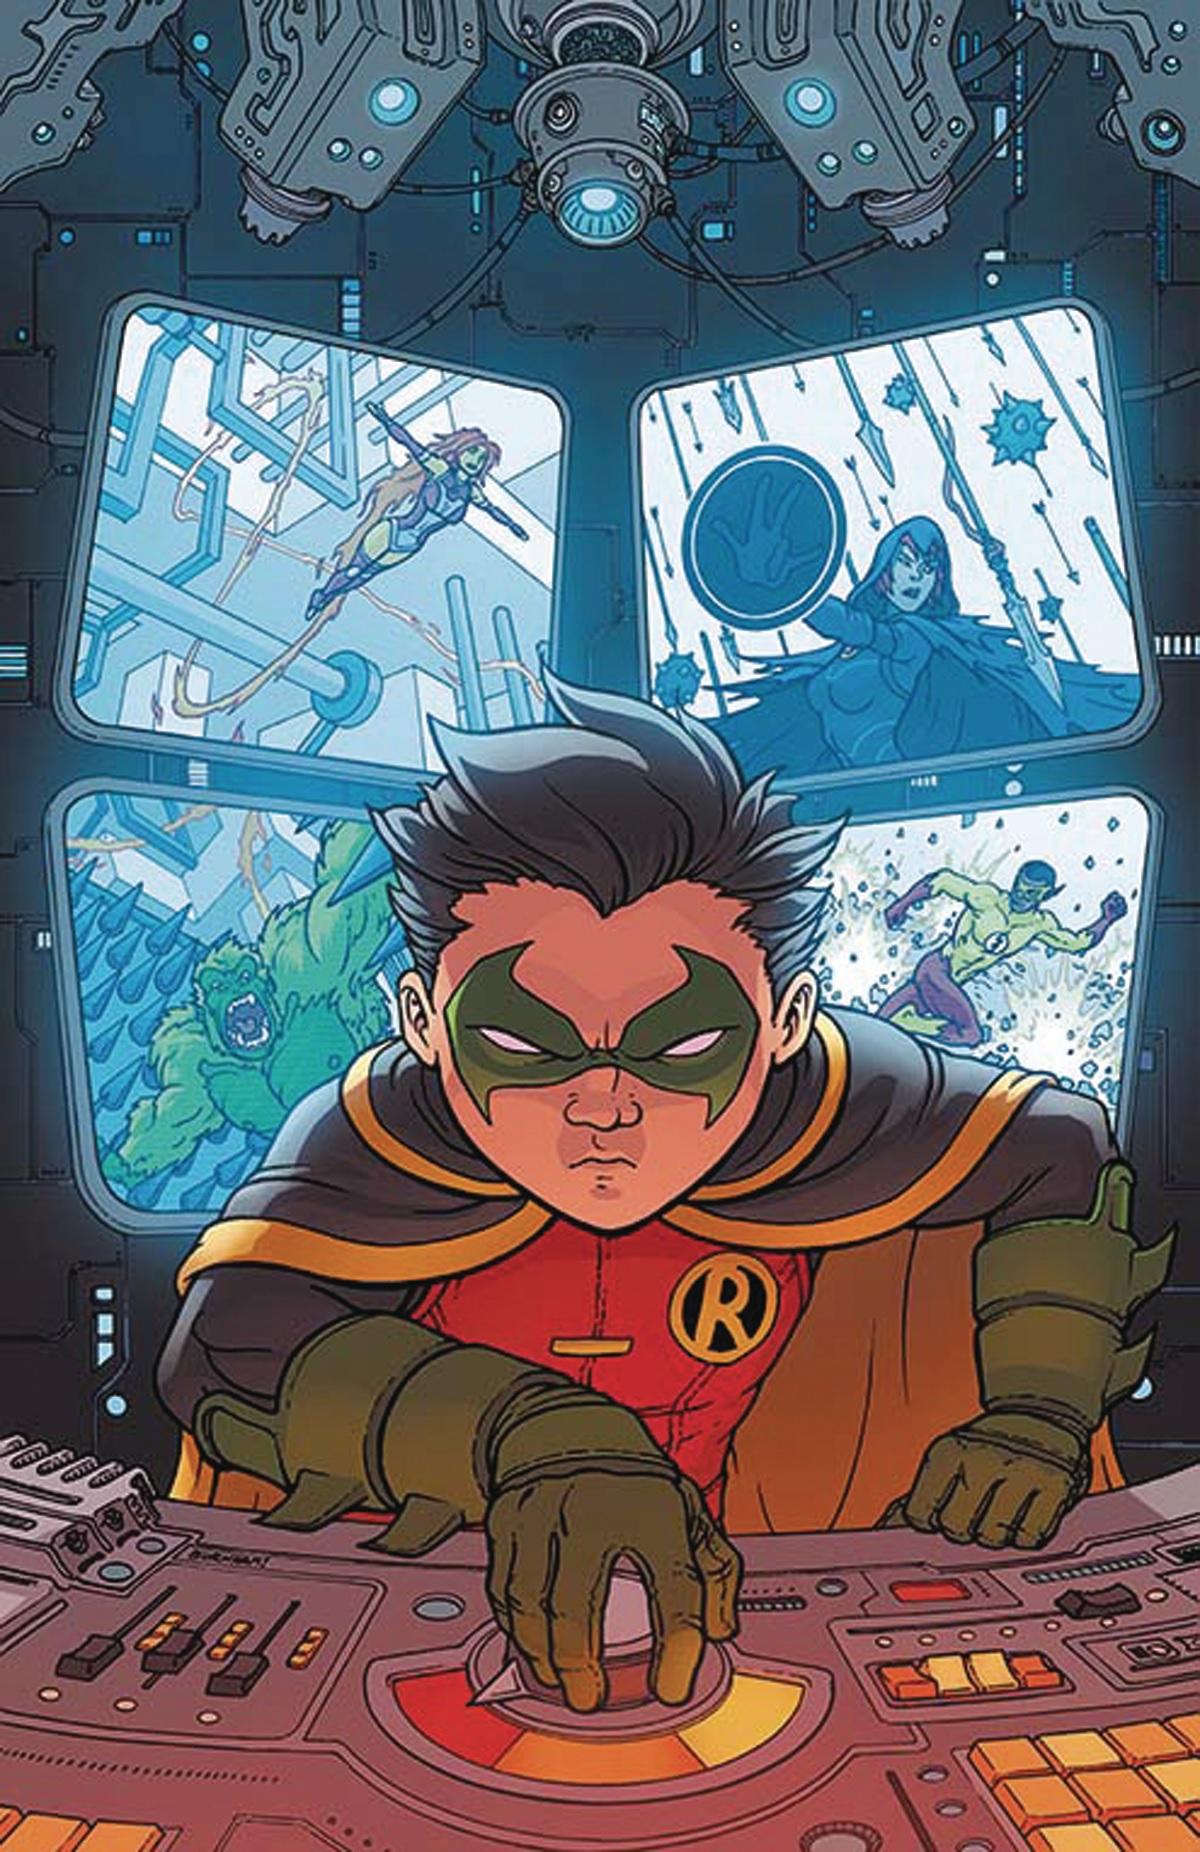 Teen Titans Vol 6 5 Textless Variant.jpg